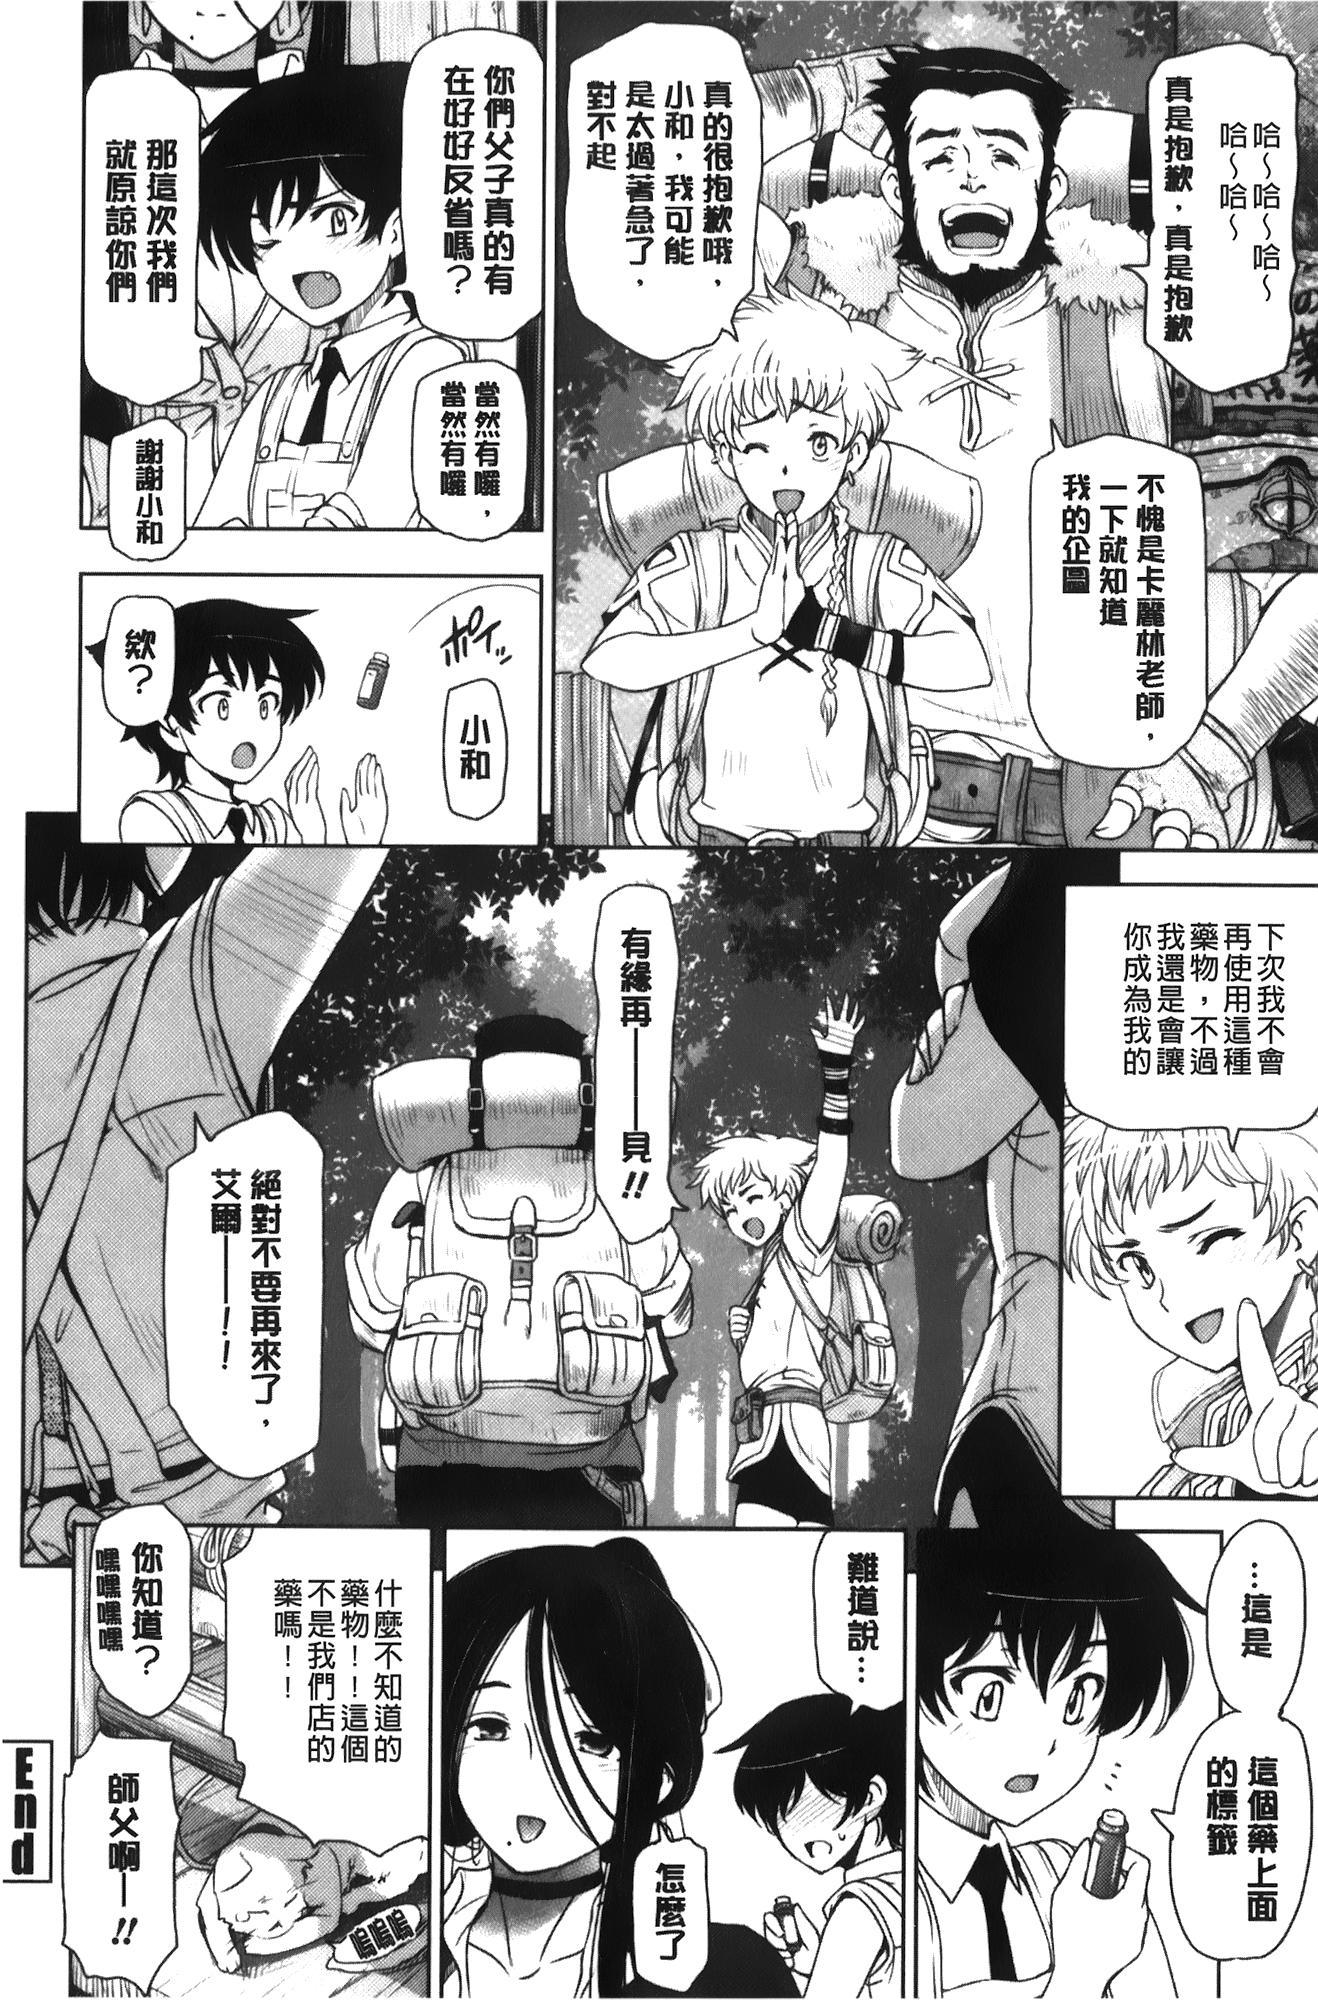 Majo × Shota ~ Genteiban | 魔女X小正太 限定版 70